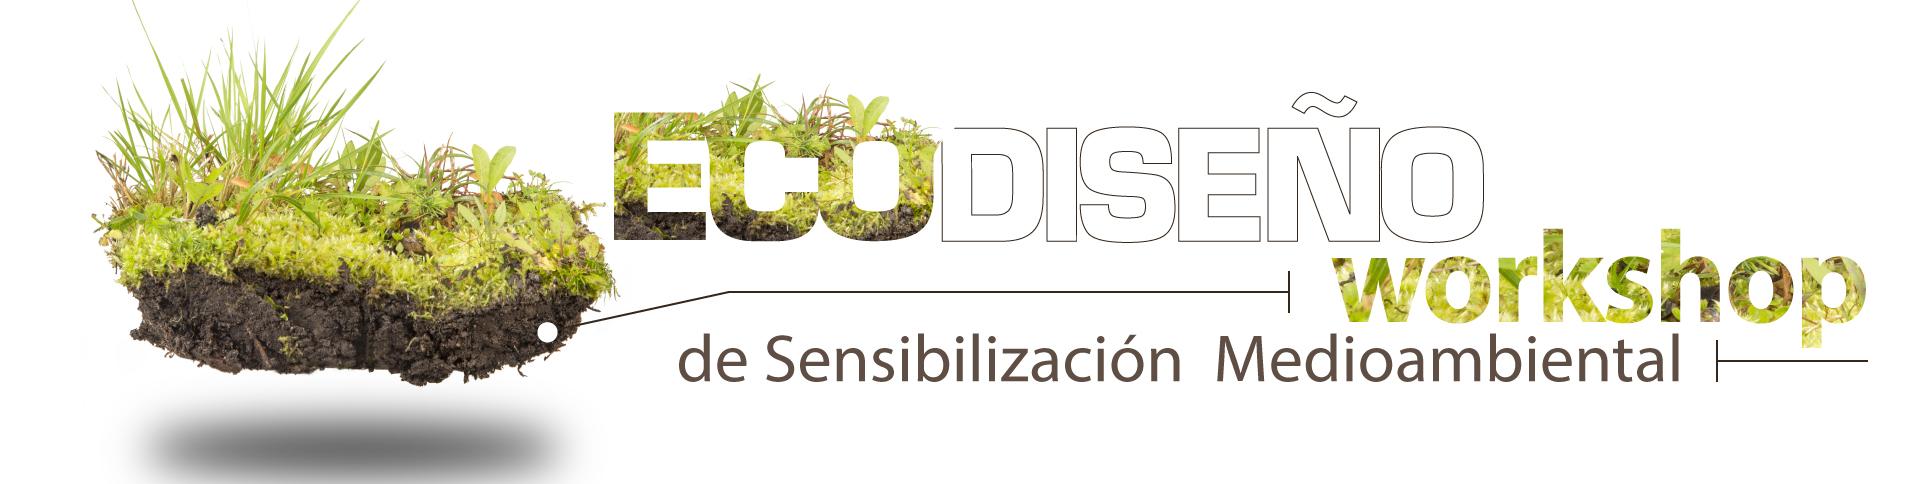 sensib-medioambienta-degren